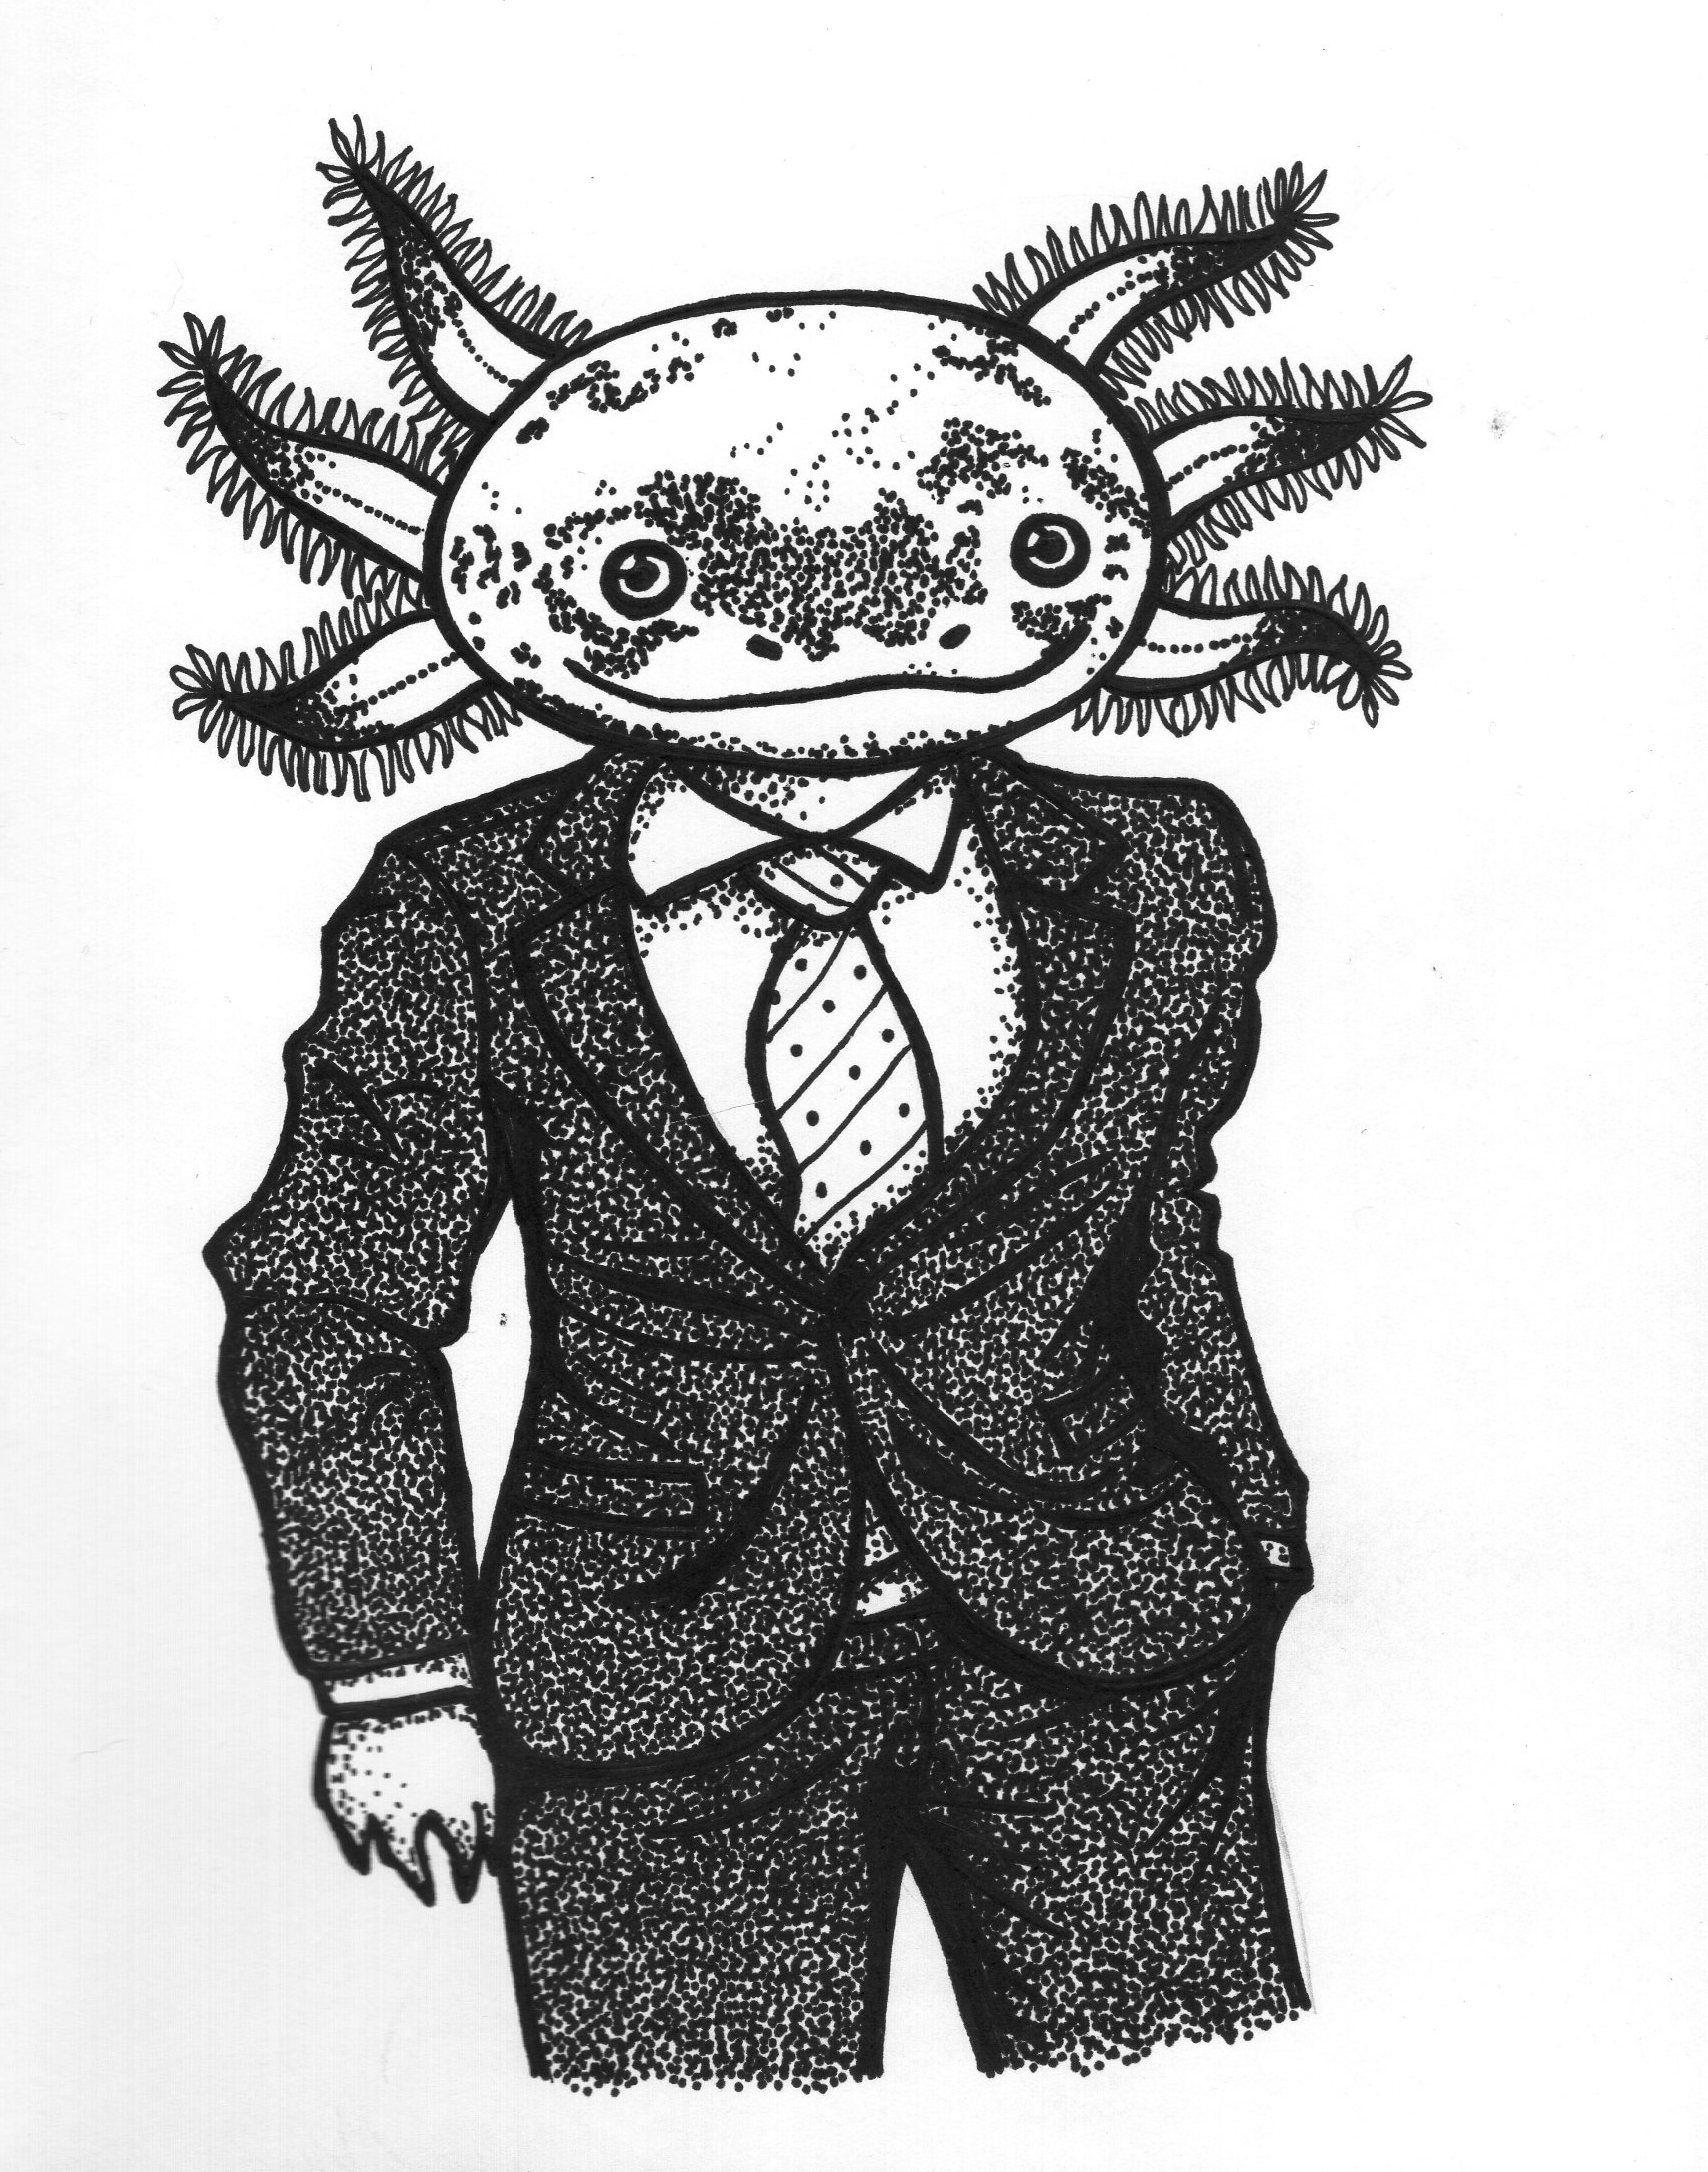 Axolotl Axolote | Dibujo | Pinterest | Dibujo